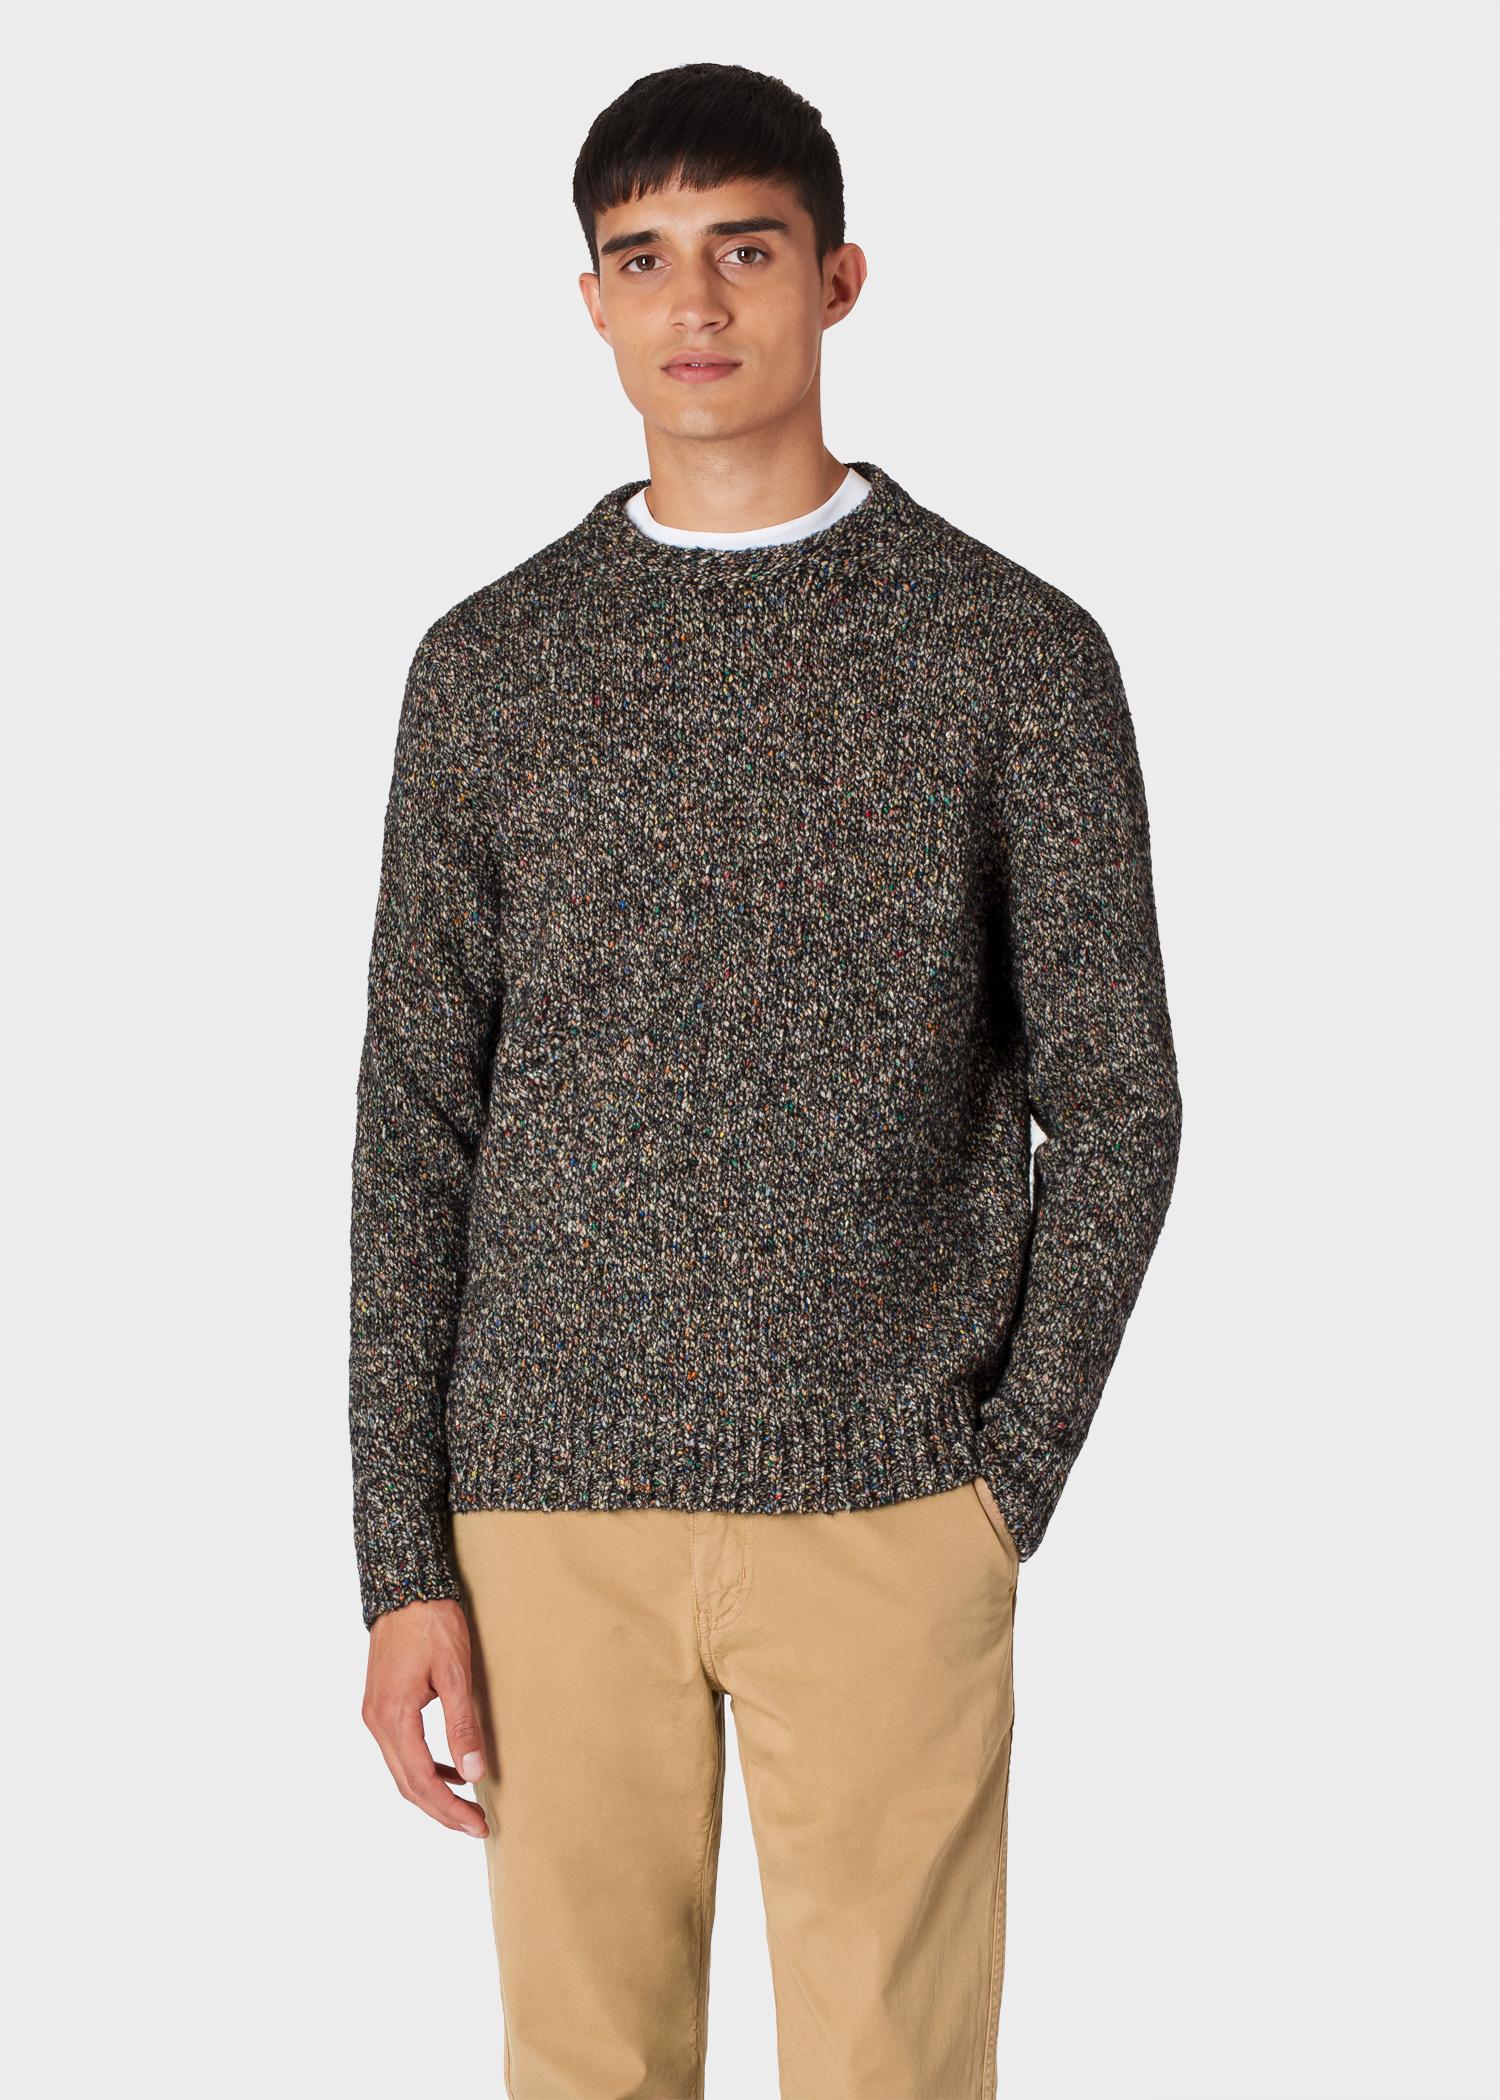 92667afb160 Men's Black Oversized Wool-Blend Twisted-Yarn Sweater